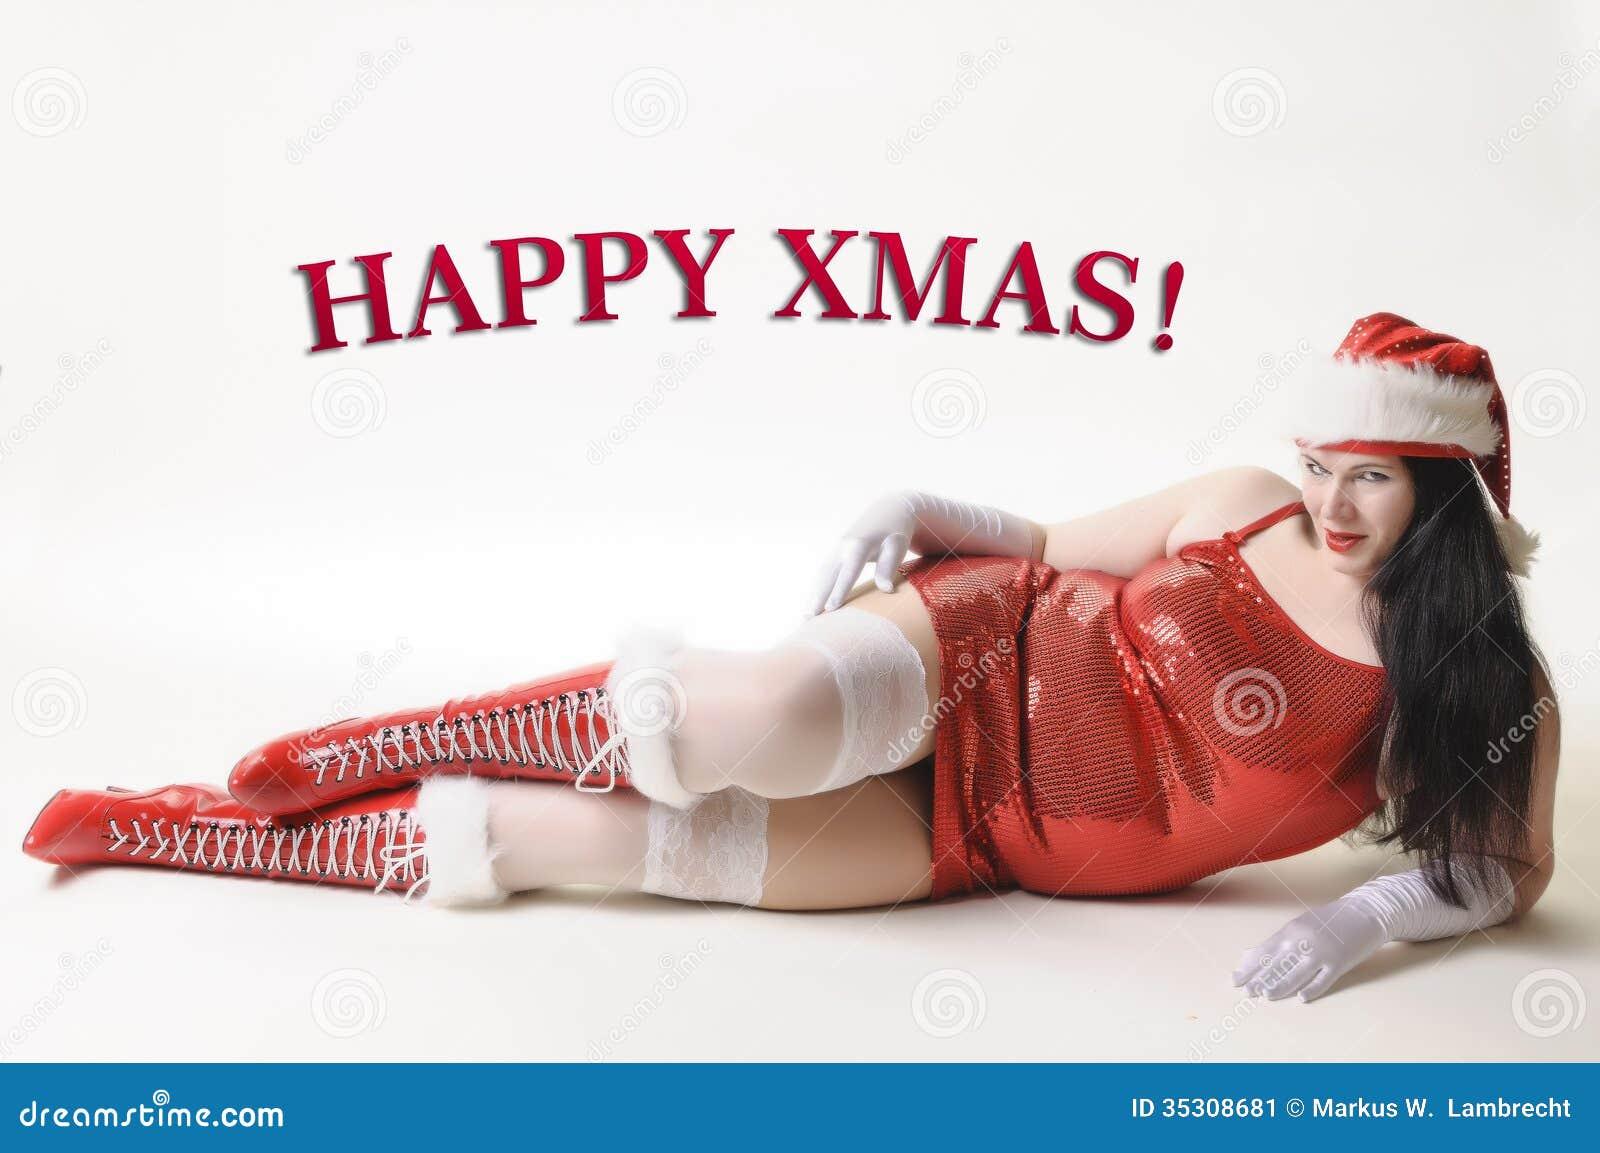 Happy XMAS! stock image. Image of oversize, model, december - 35308681